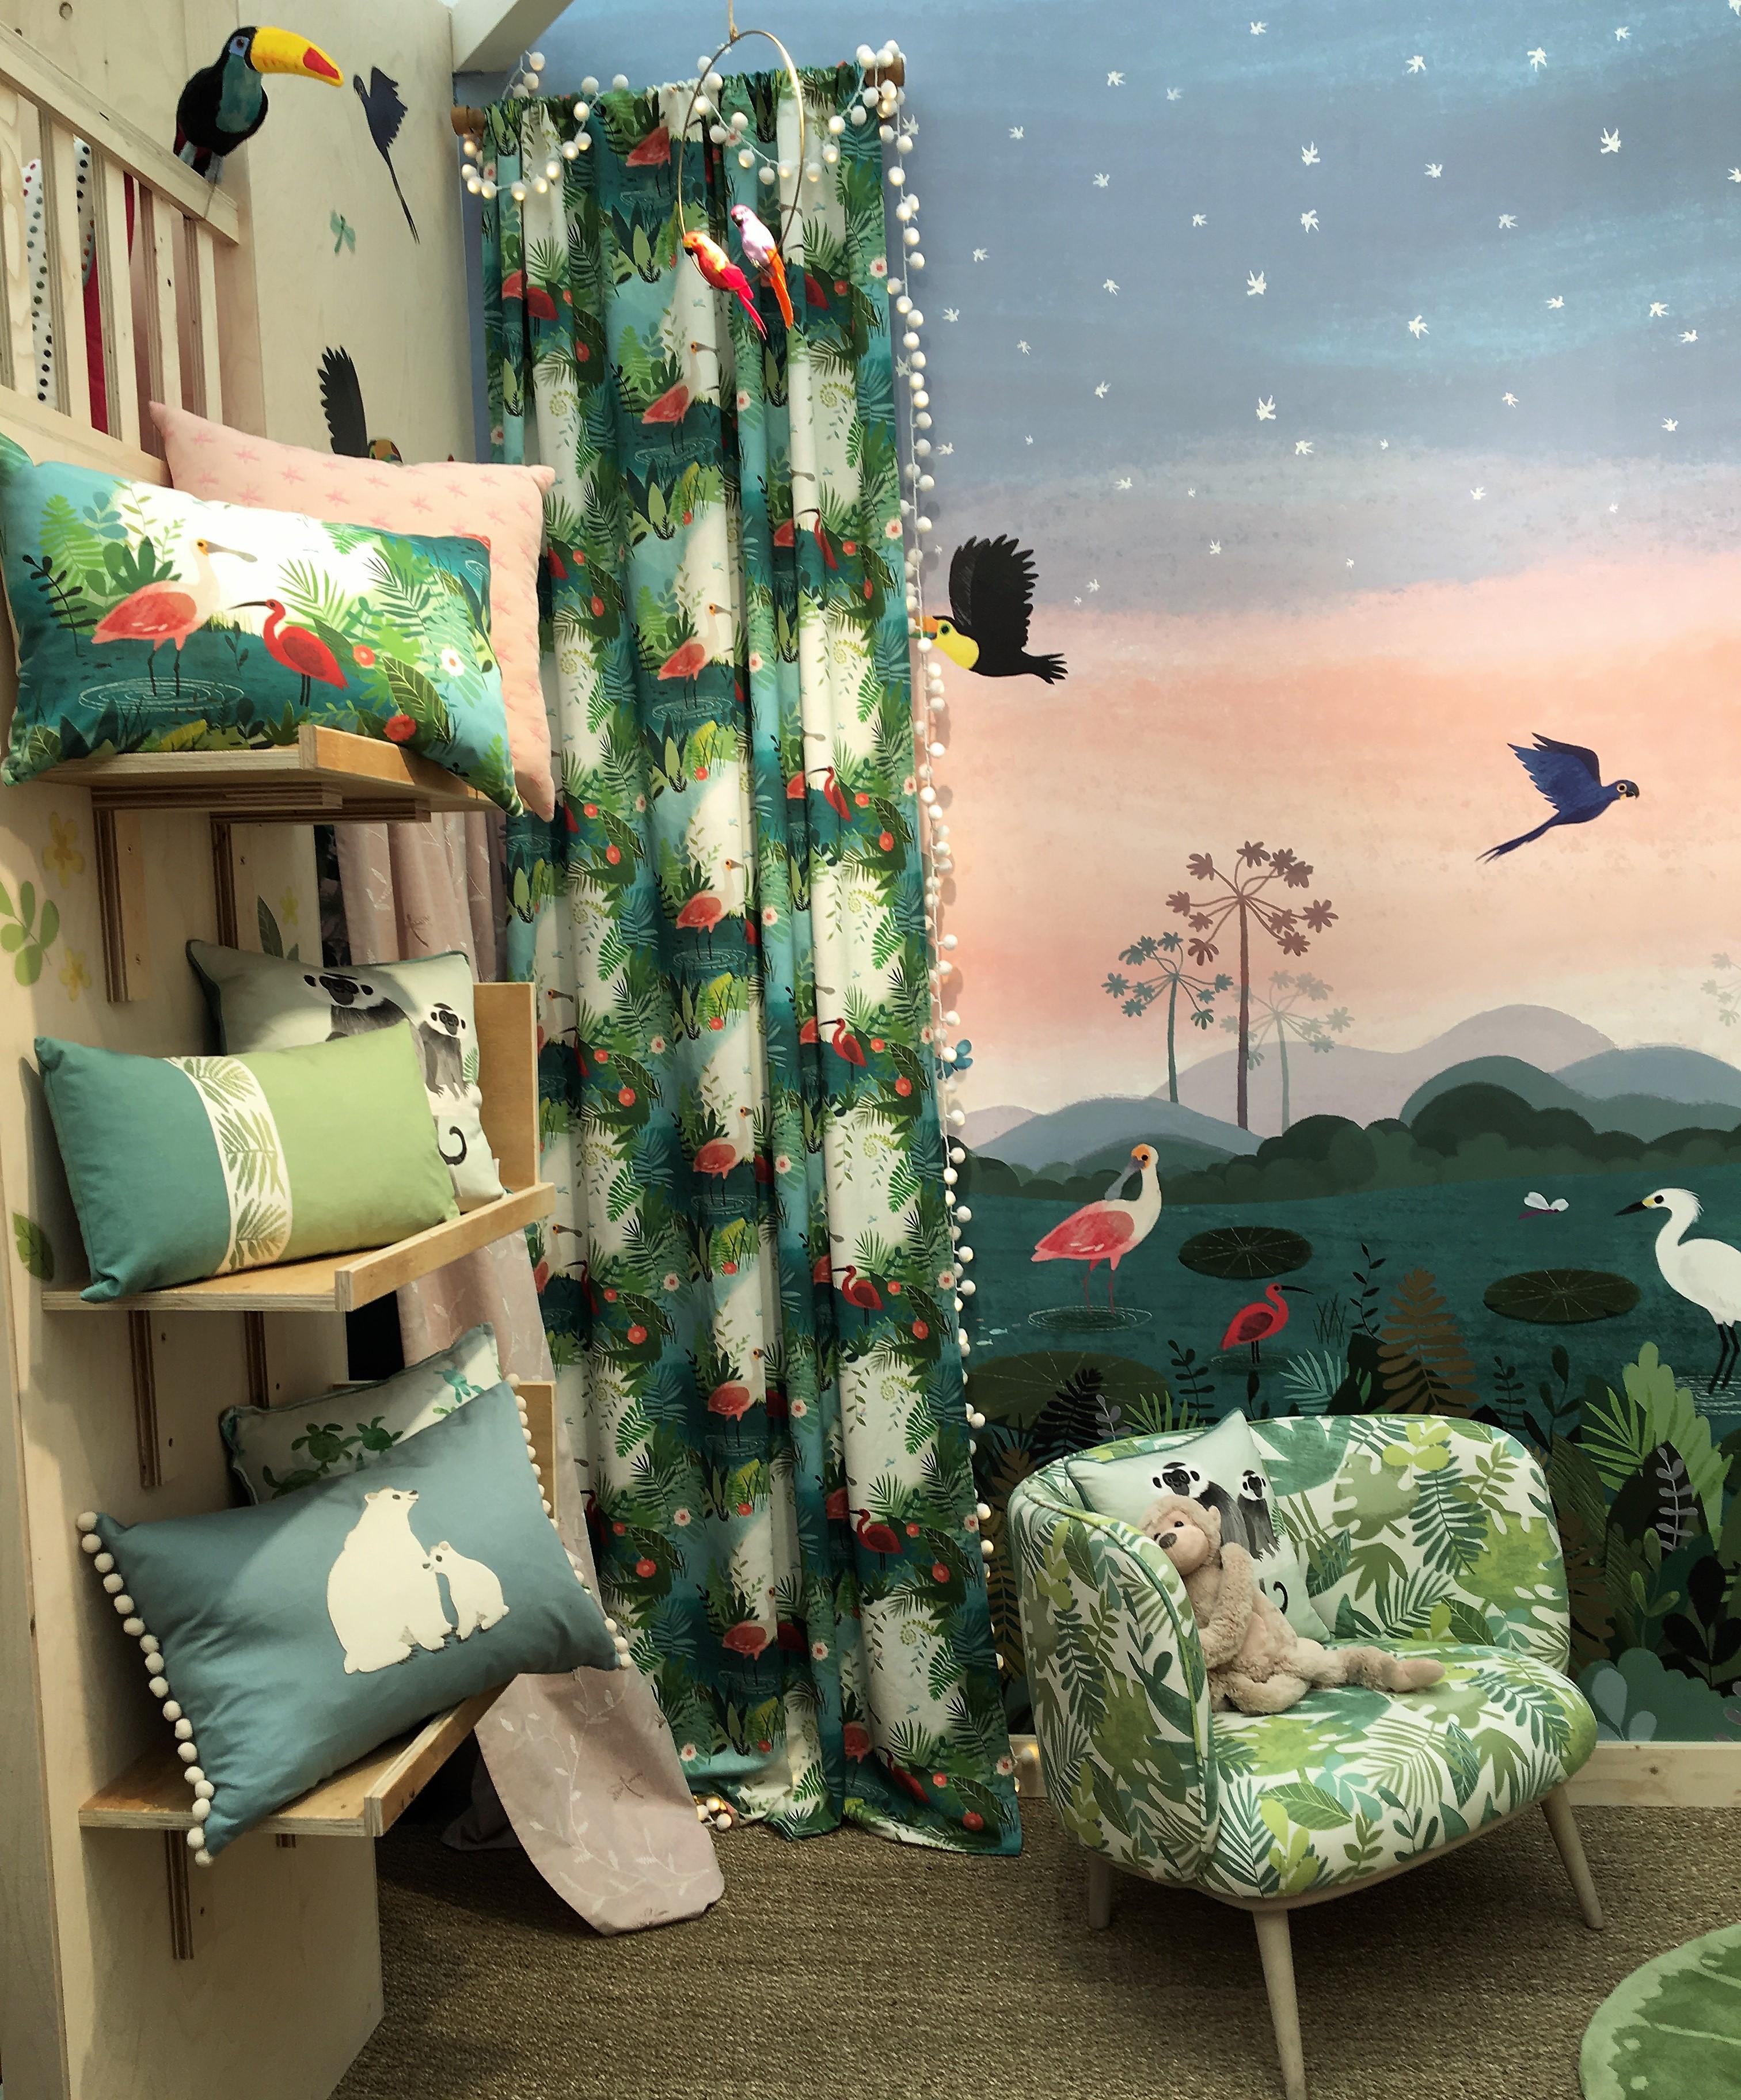 """Picture Book"" new range of fabrics by Fabric house villa nova at Decorex 2018 design exhibition"